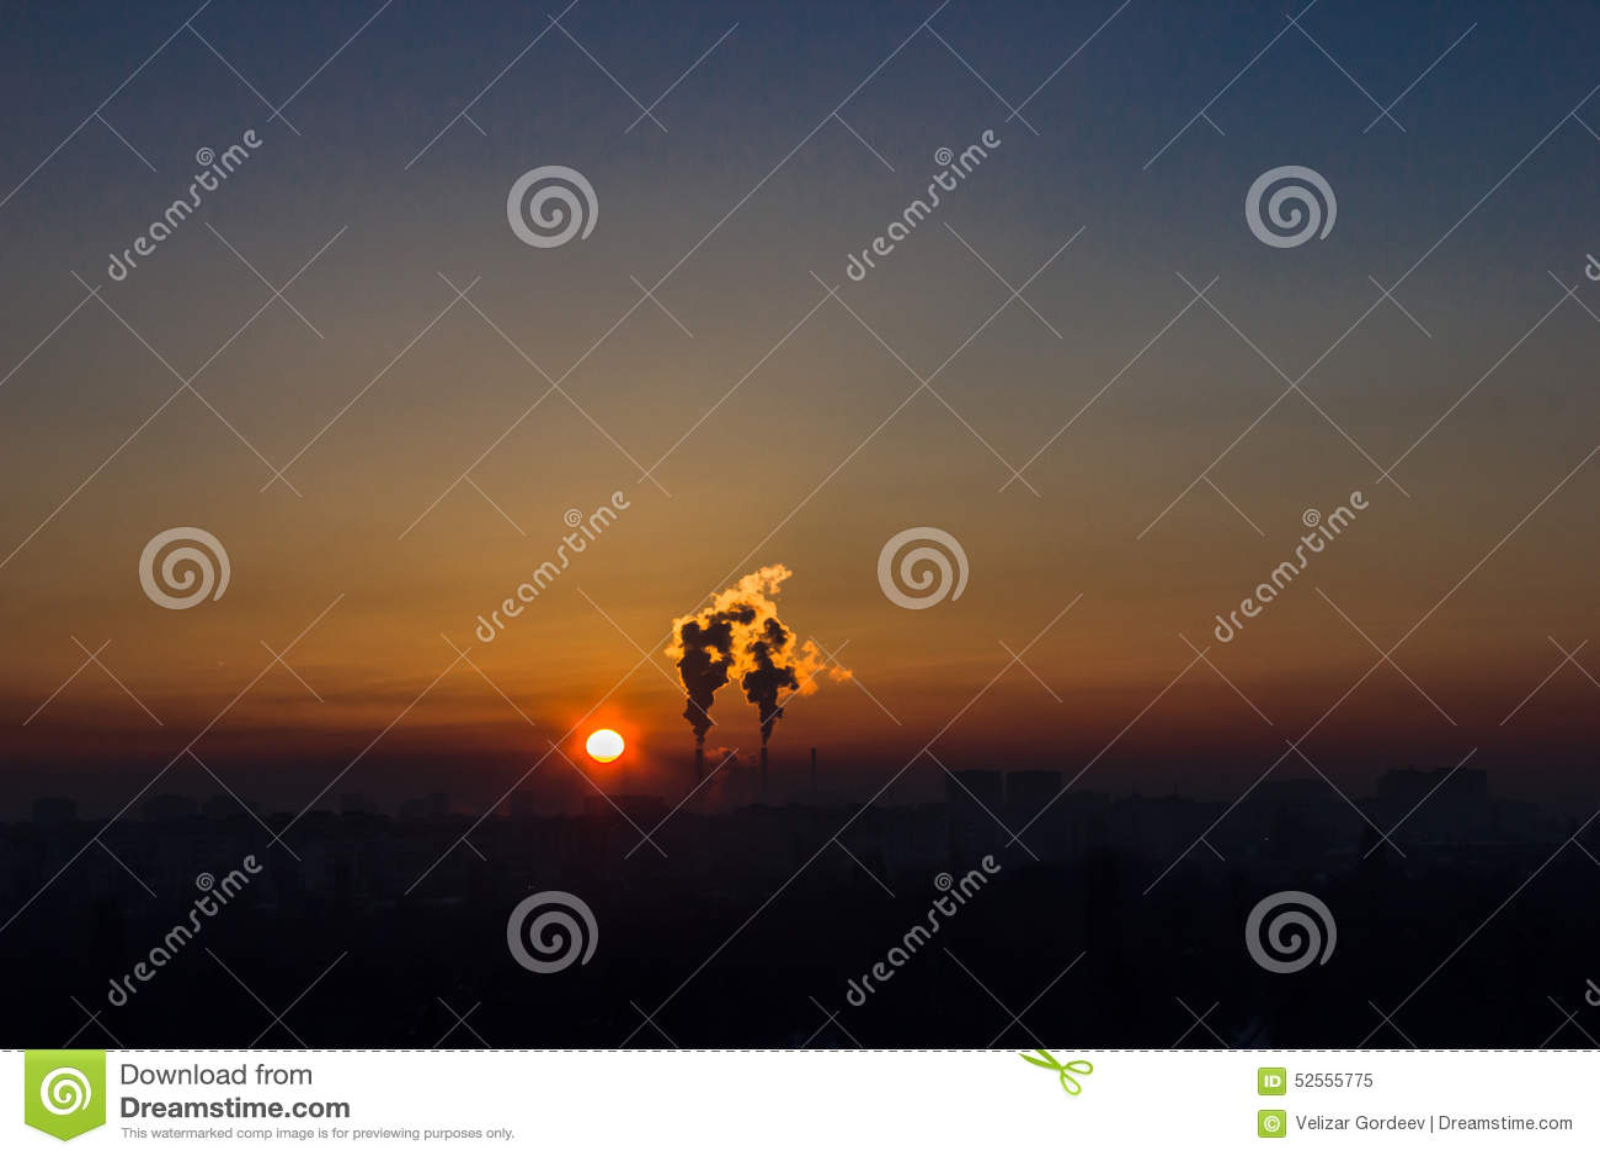 Chimneys and dark smoke over factory at sunset